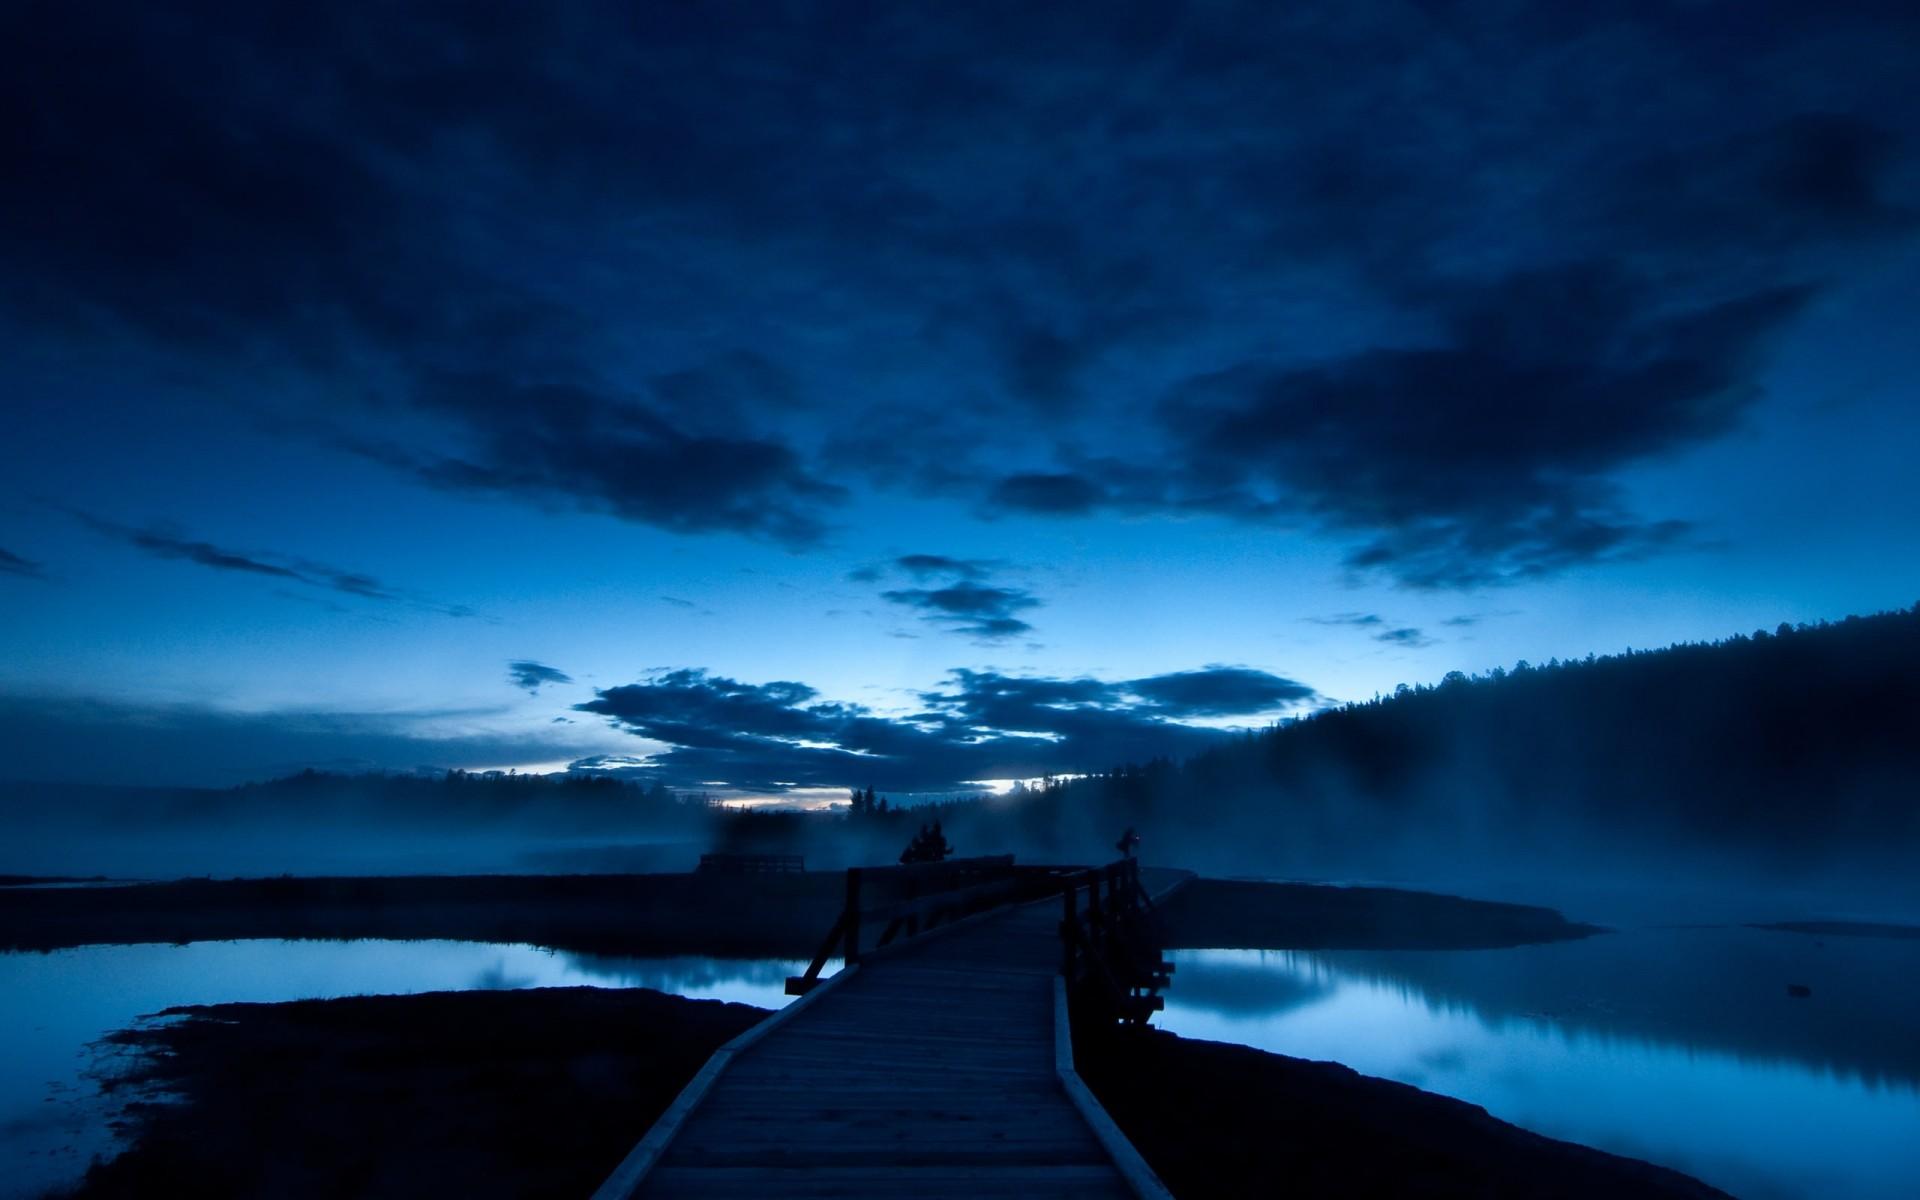 мост закат озеро небо загрузить